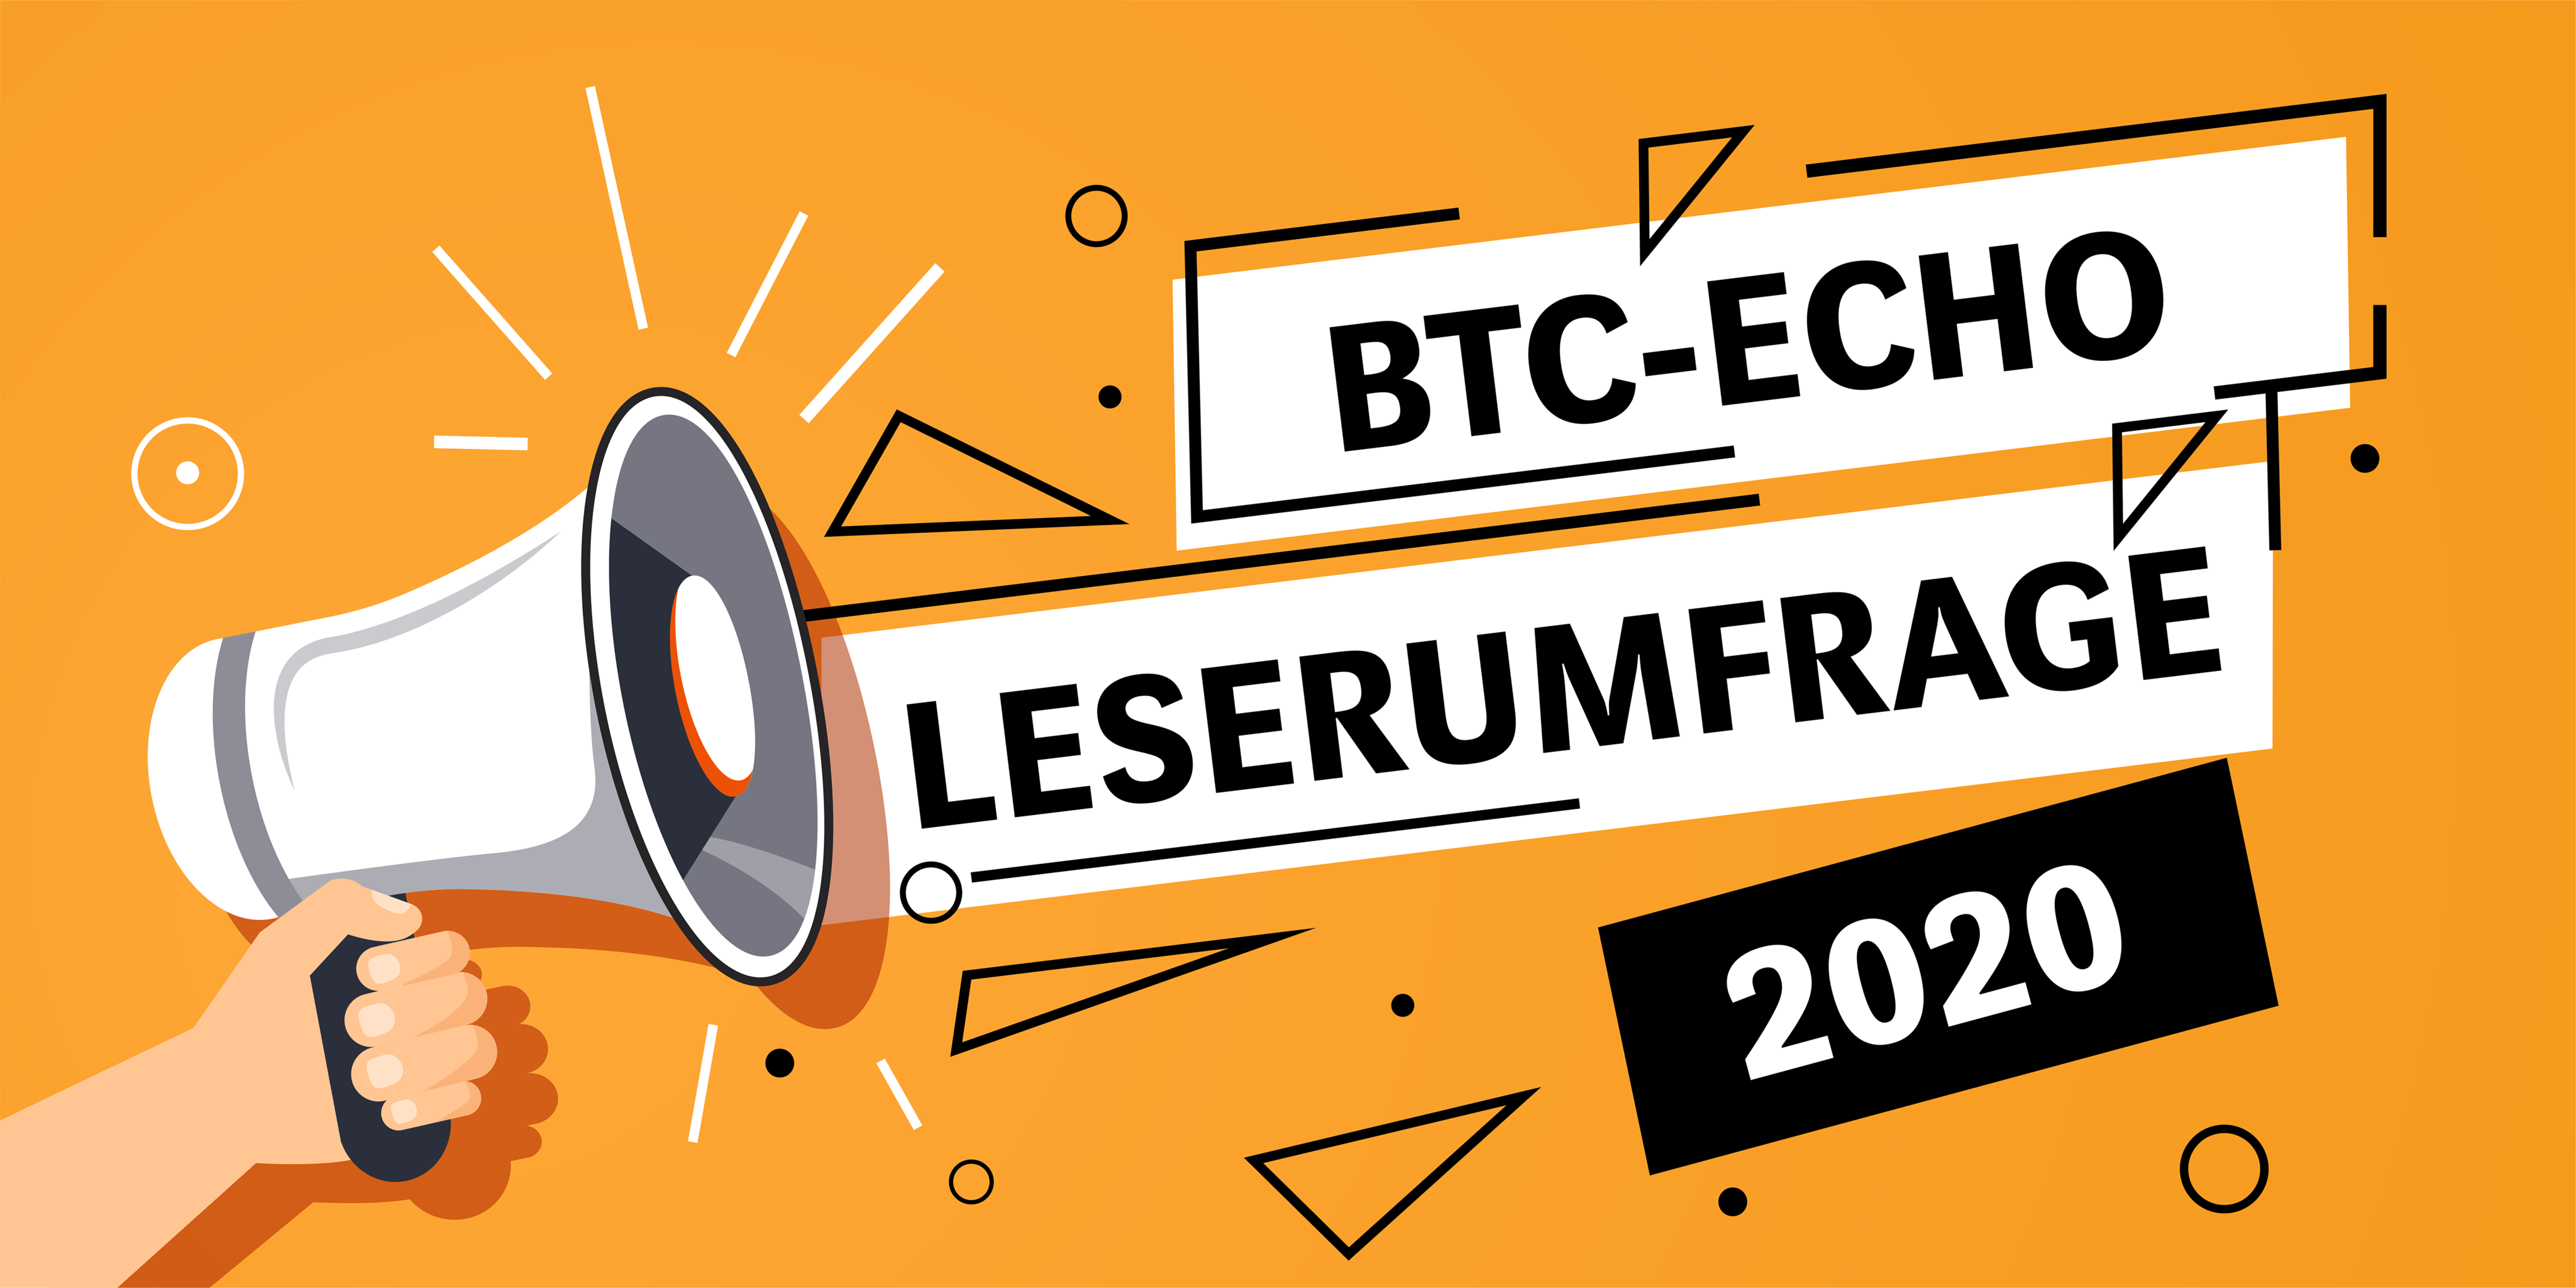 BTC-ECHO Leserumfrage